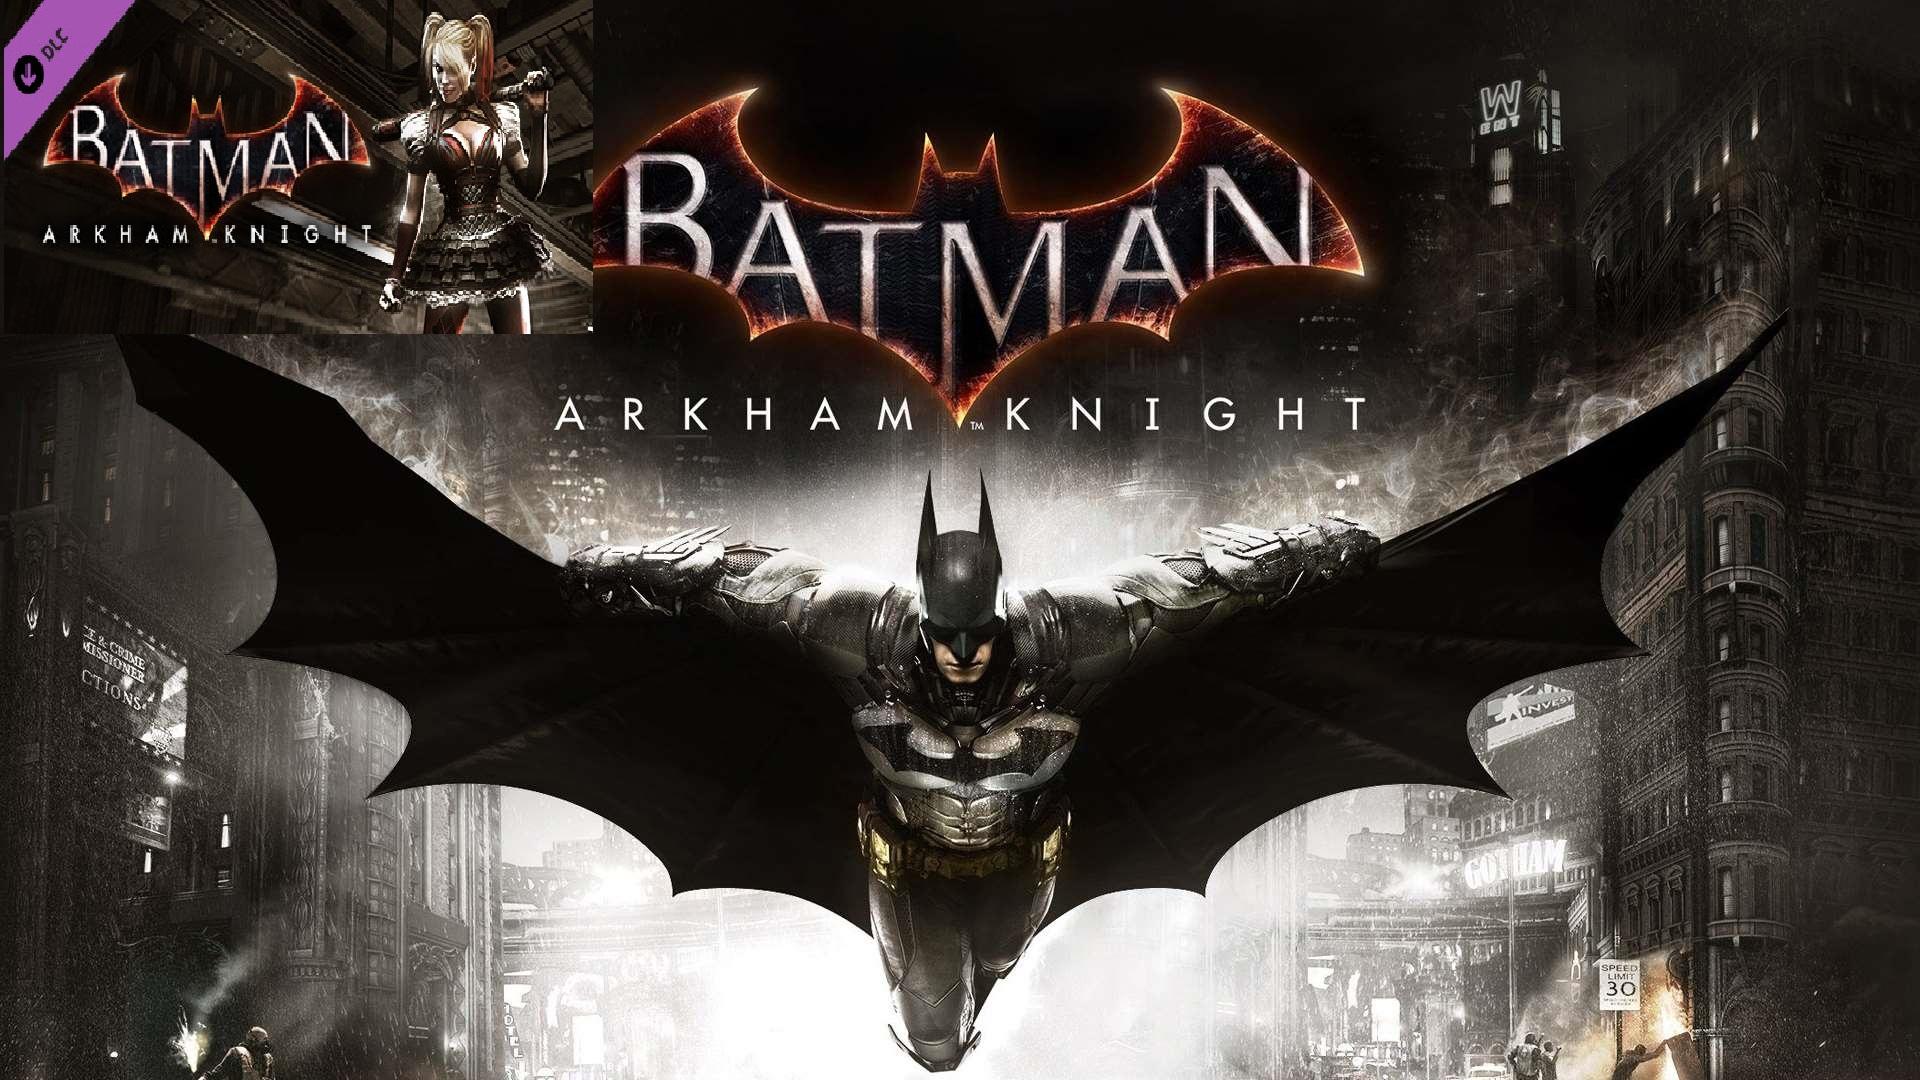 Joc Batman: Arkham Knight - Harley Quinn (DLC) PC Steam CD Key 0